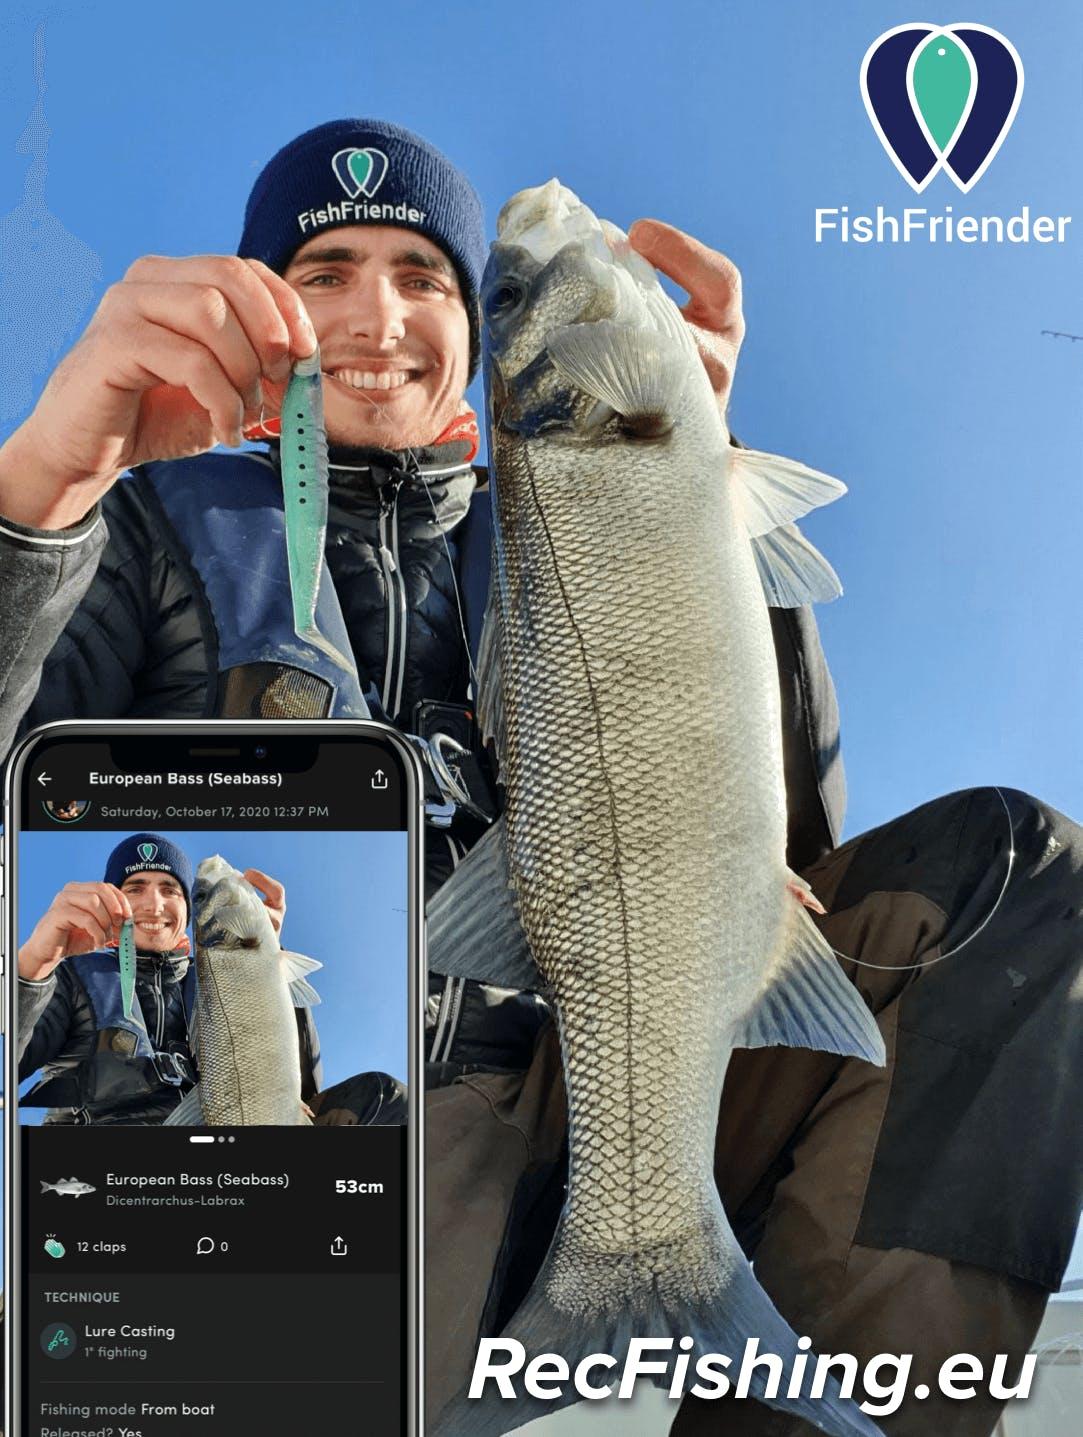 FishFriender is an official partner of the RecFishing.eu programme